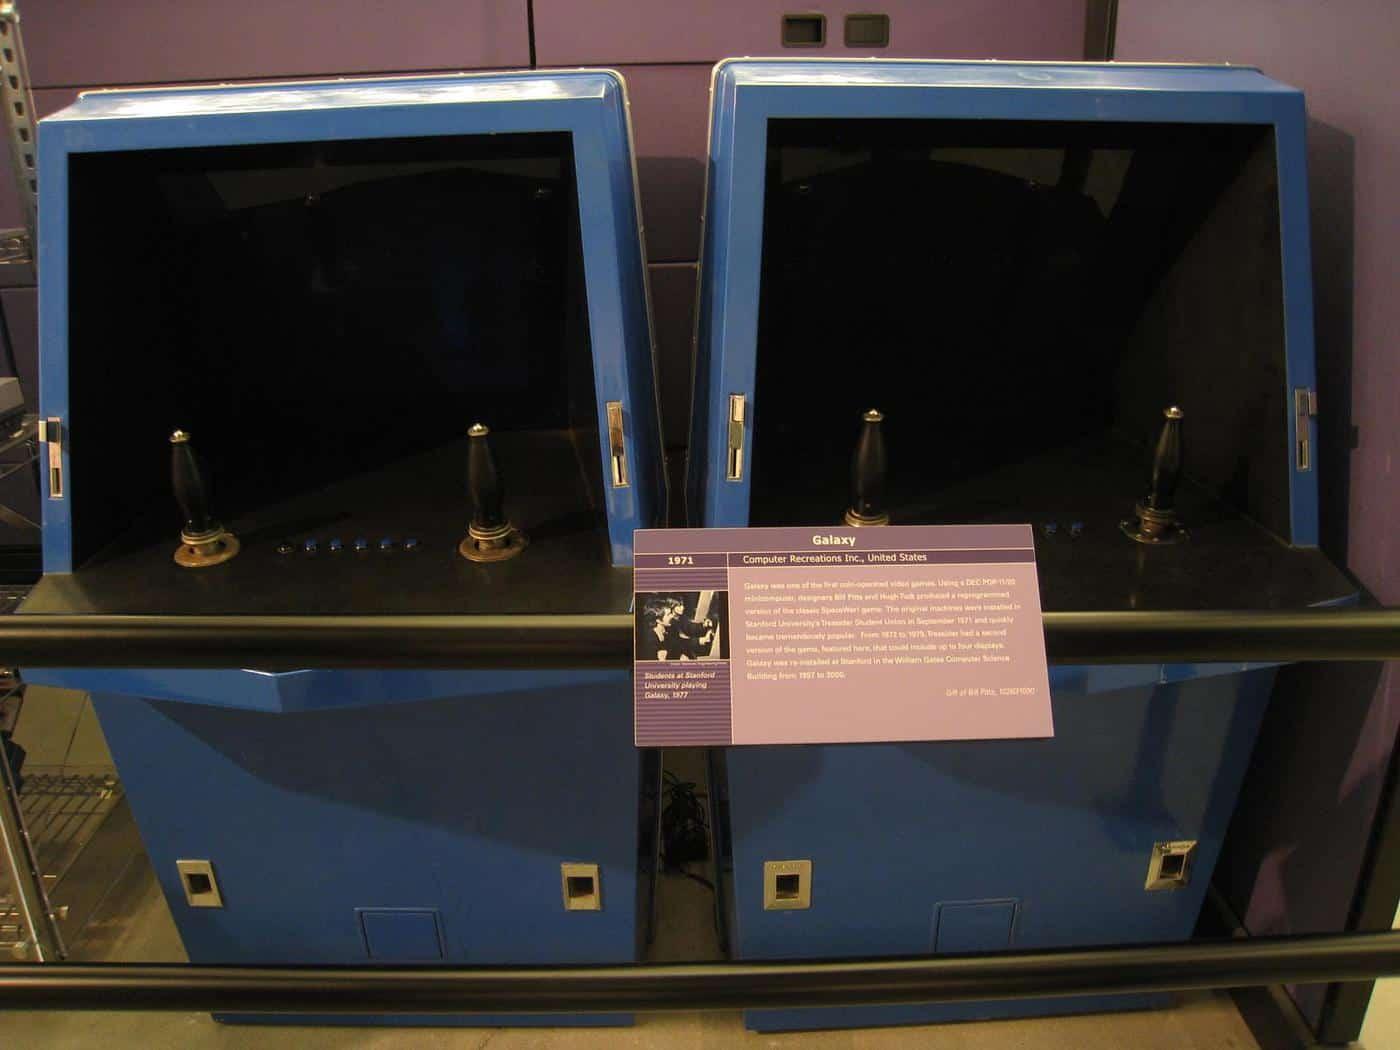 Galaxy Game, premier jeu d'arcade